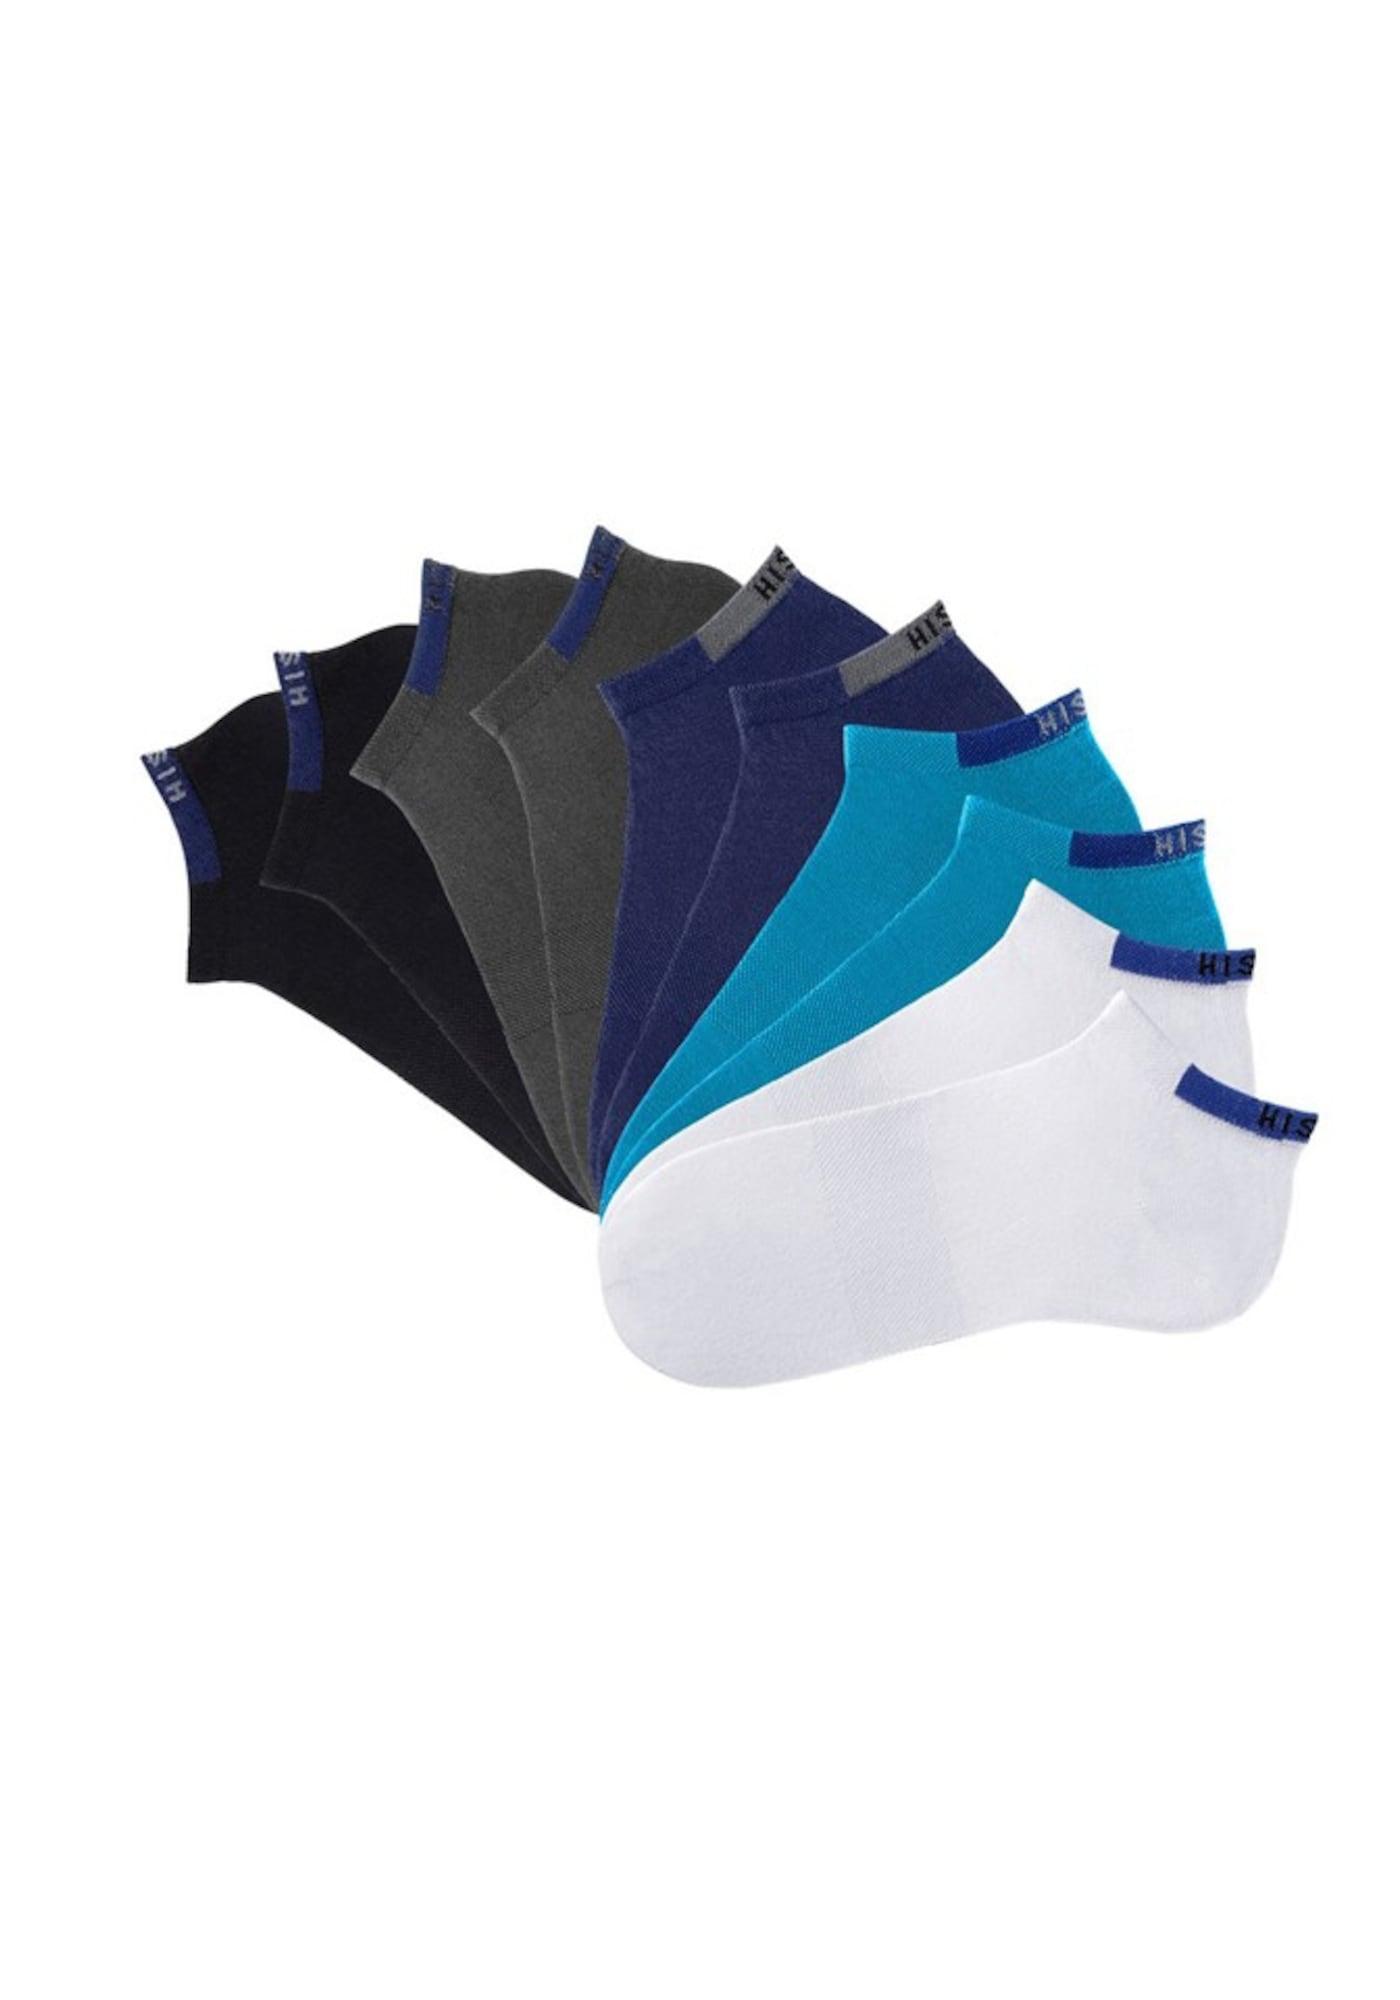 AboutYou   Damen H.I.S Sneakersocken blau, grau, schwarz